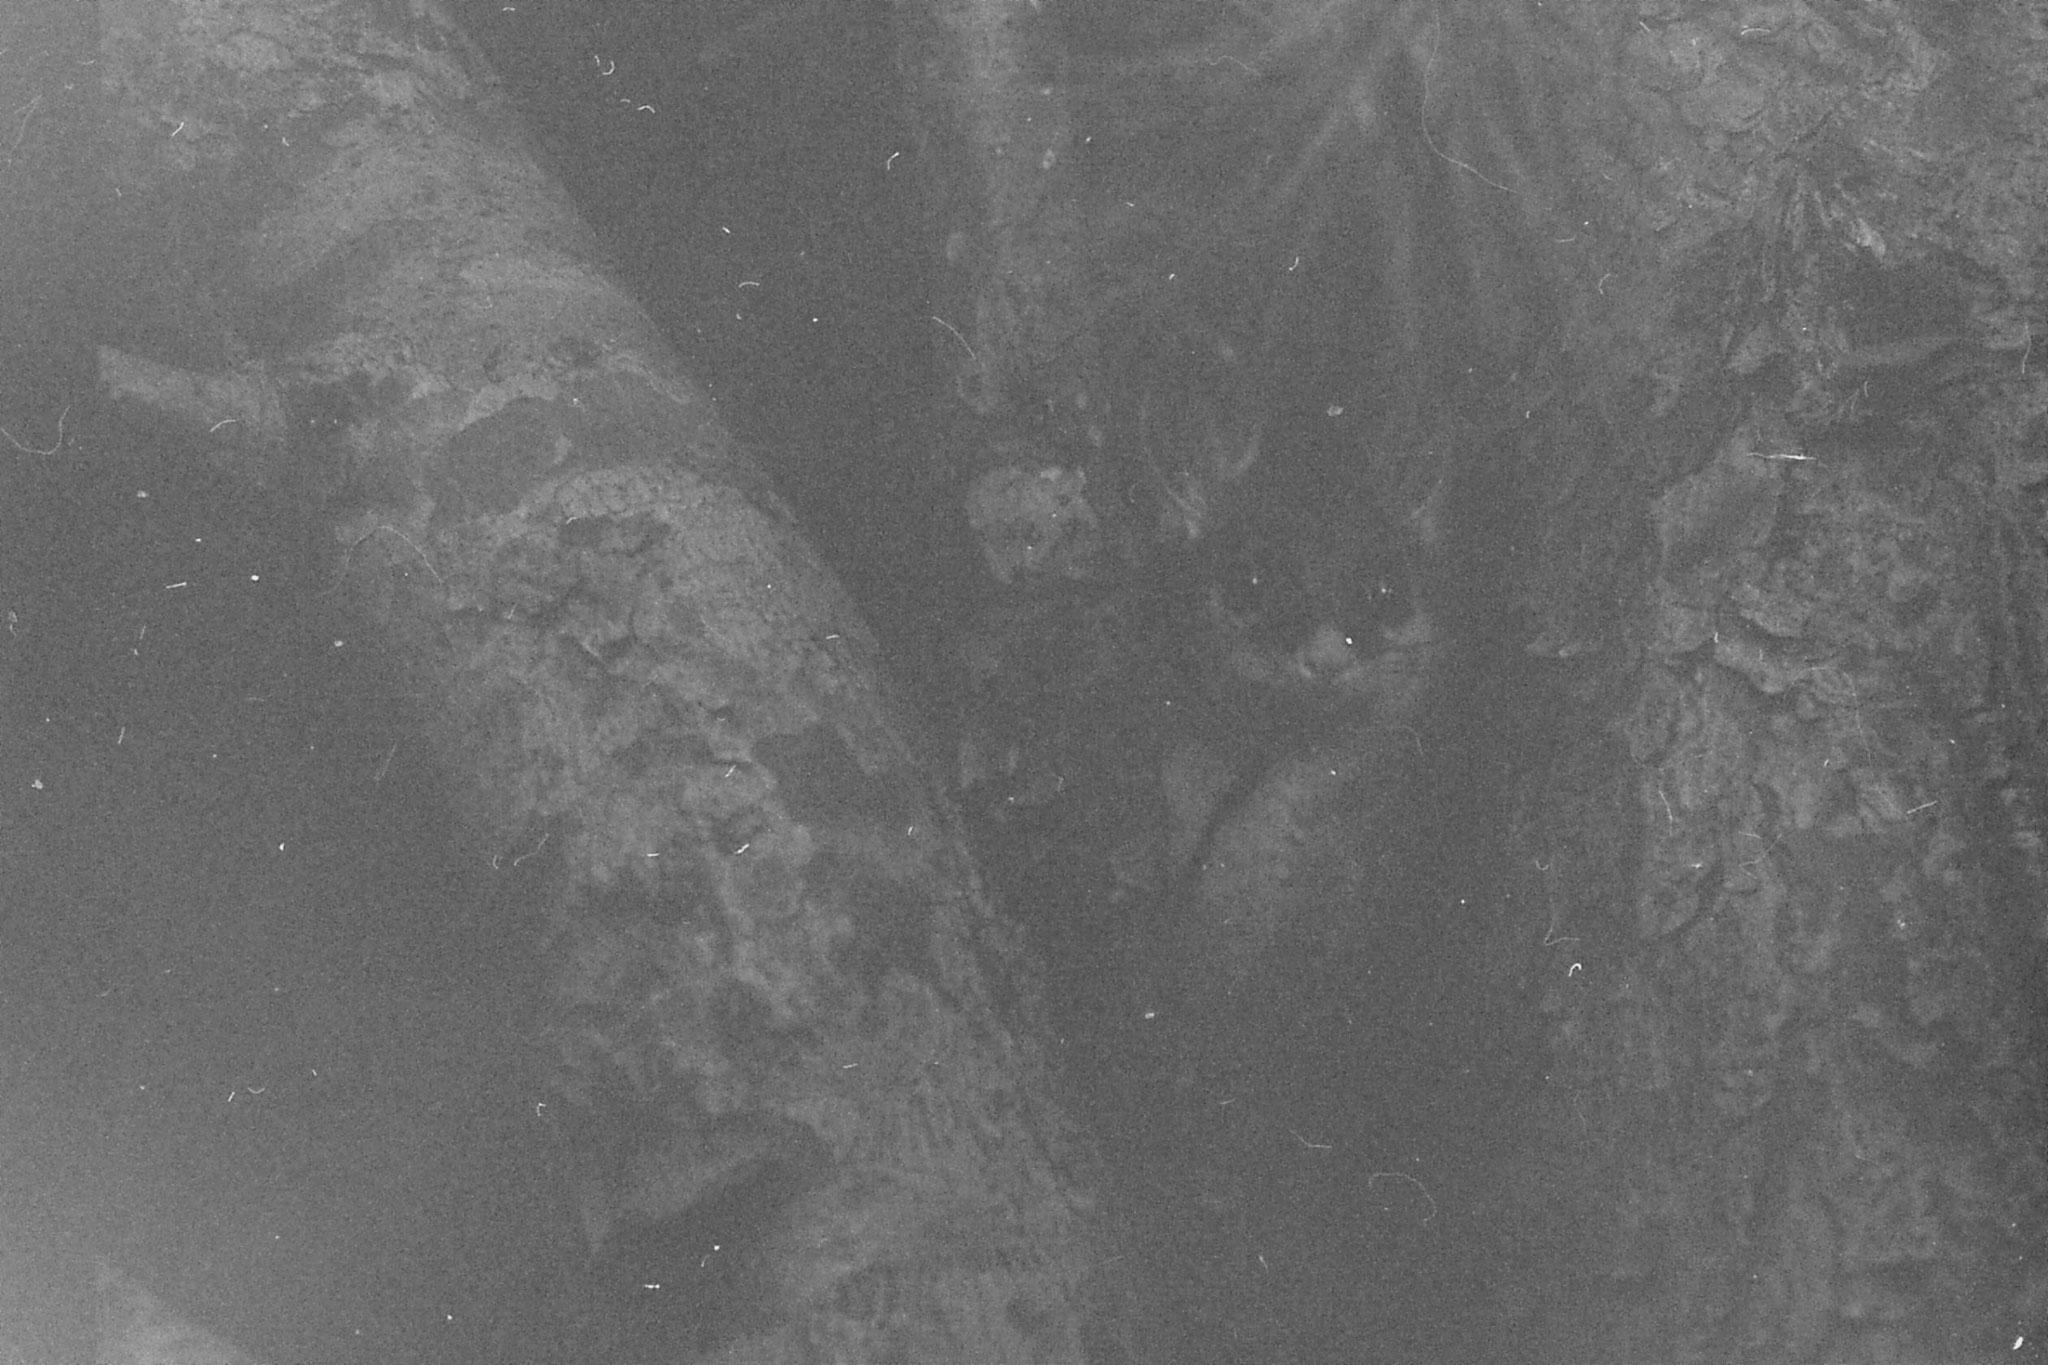 22/9/1990: 3: Dimboola Caravan Park possums